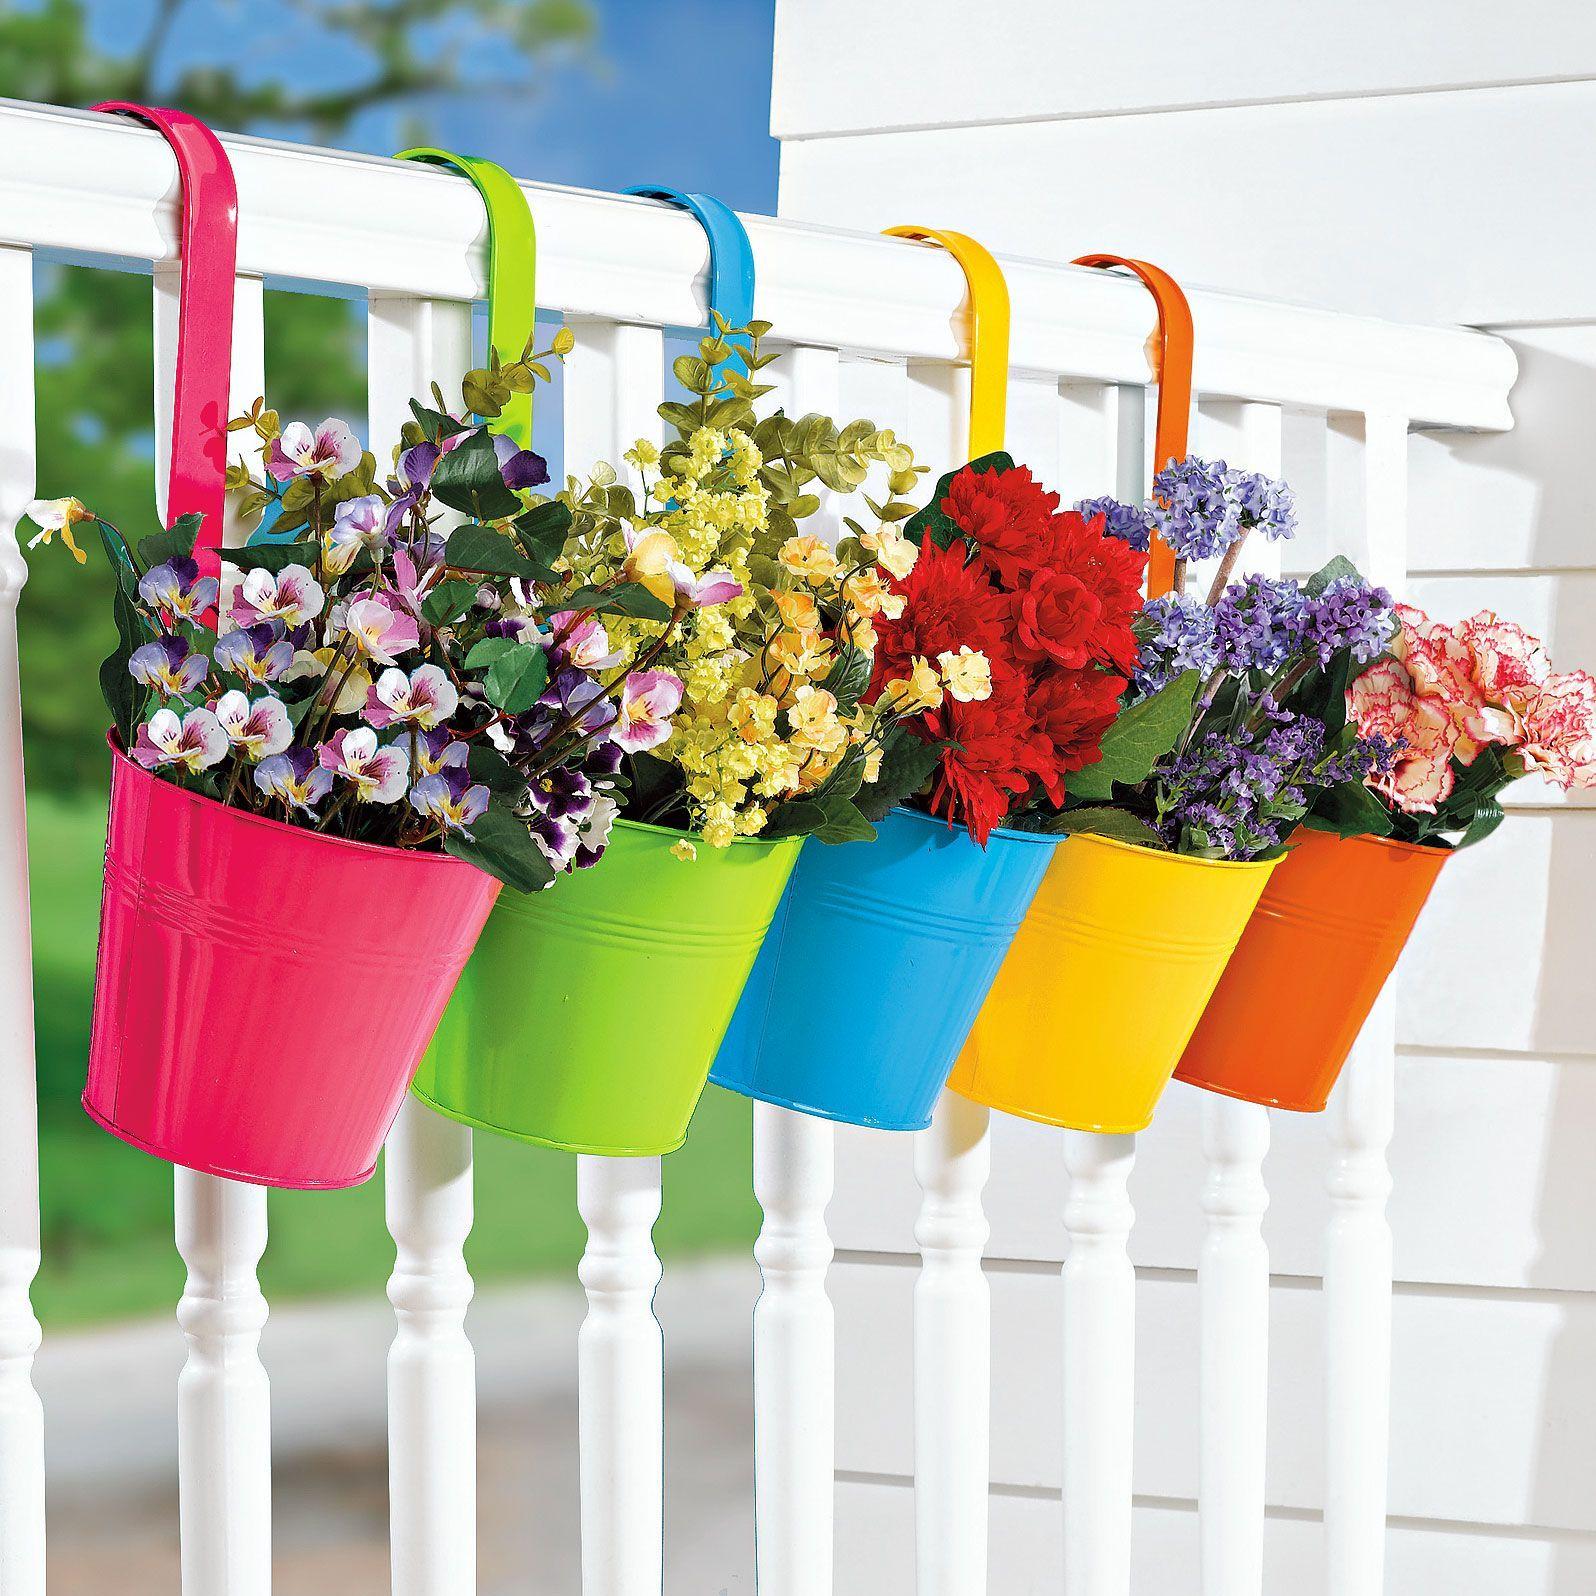 Bucket Brigade Fence Top Planters Balcony Hanging Planter Balcony Planters Flower Pots